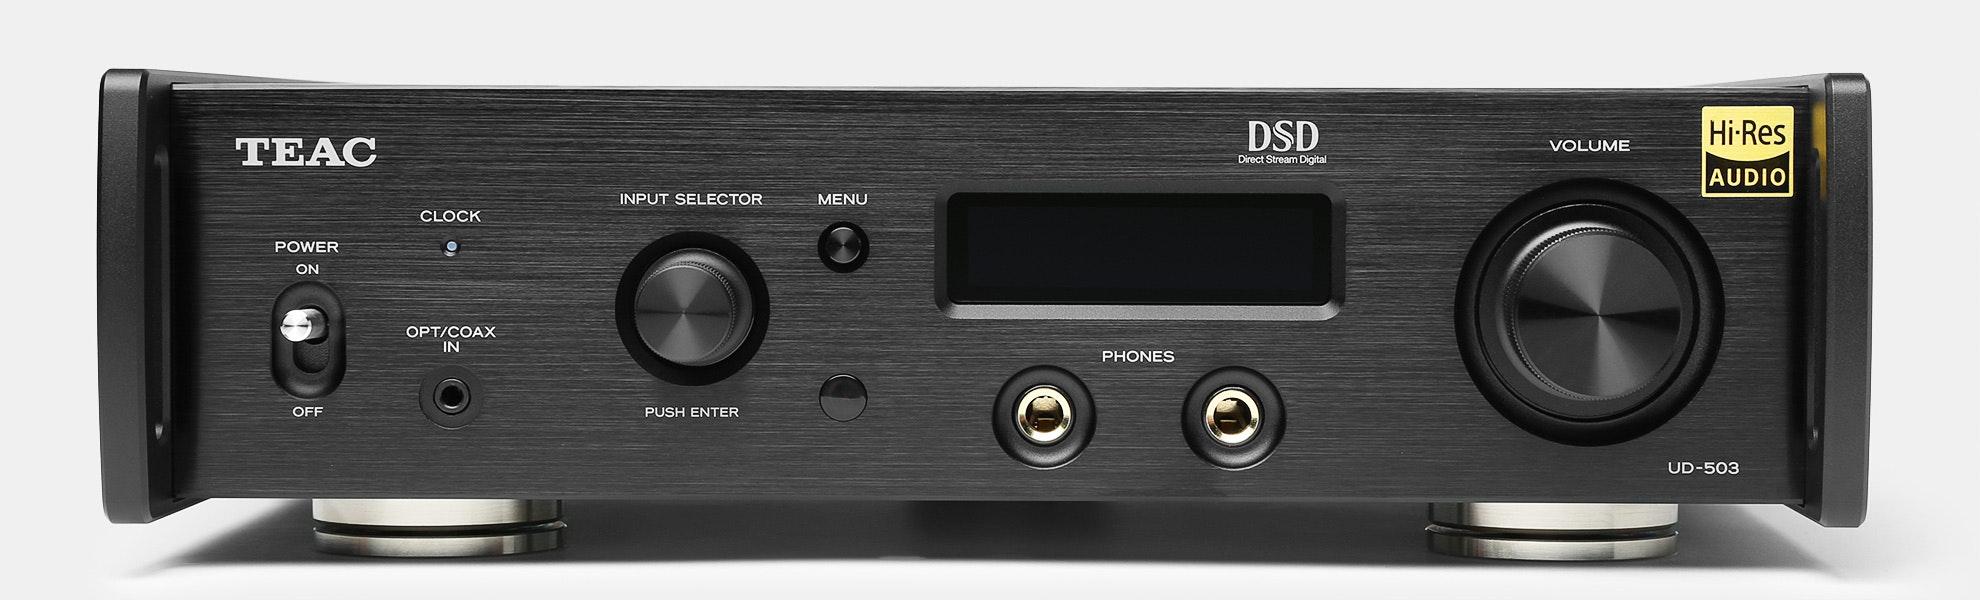 TEAC UD-503 DAC/Amp